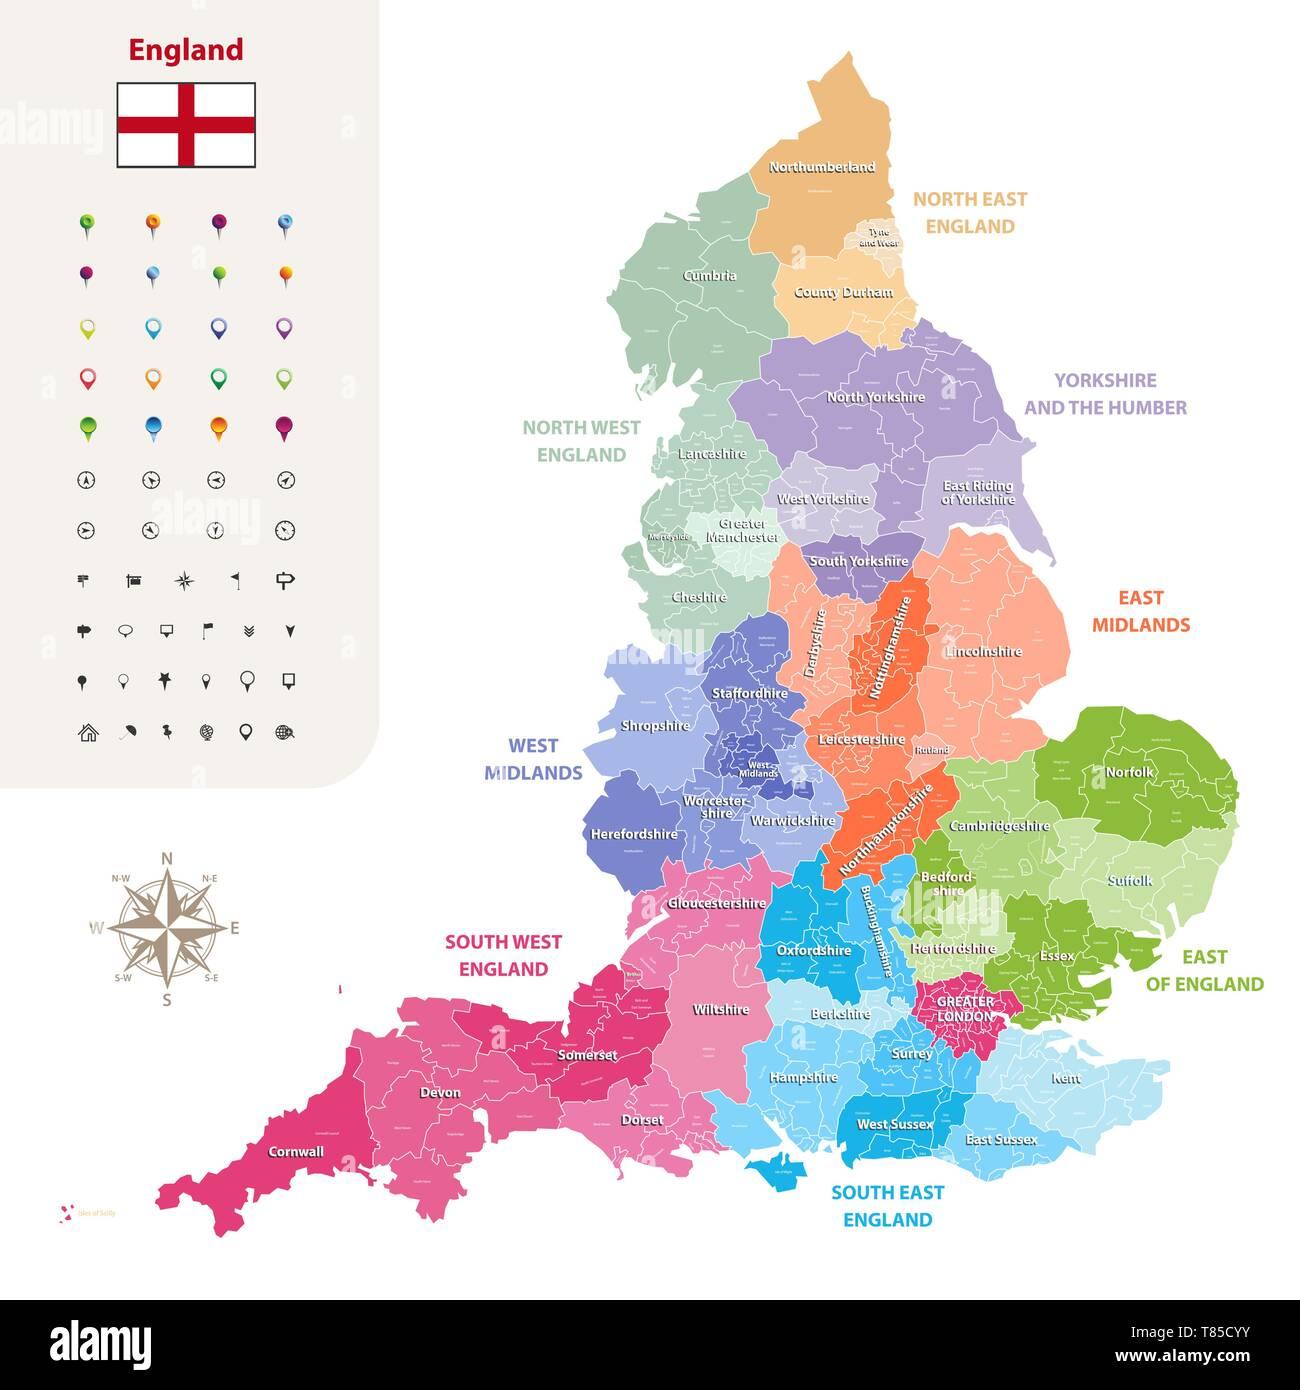 England ceremonial counties vector map - Stock Vector